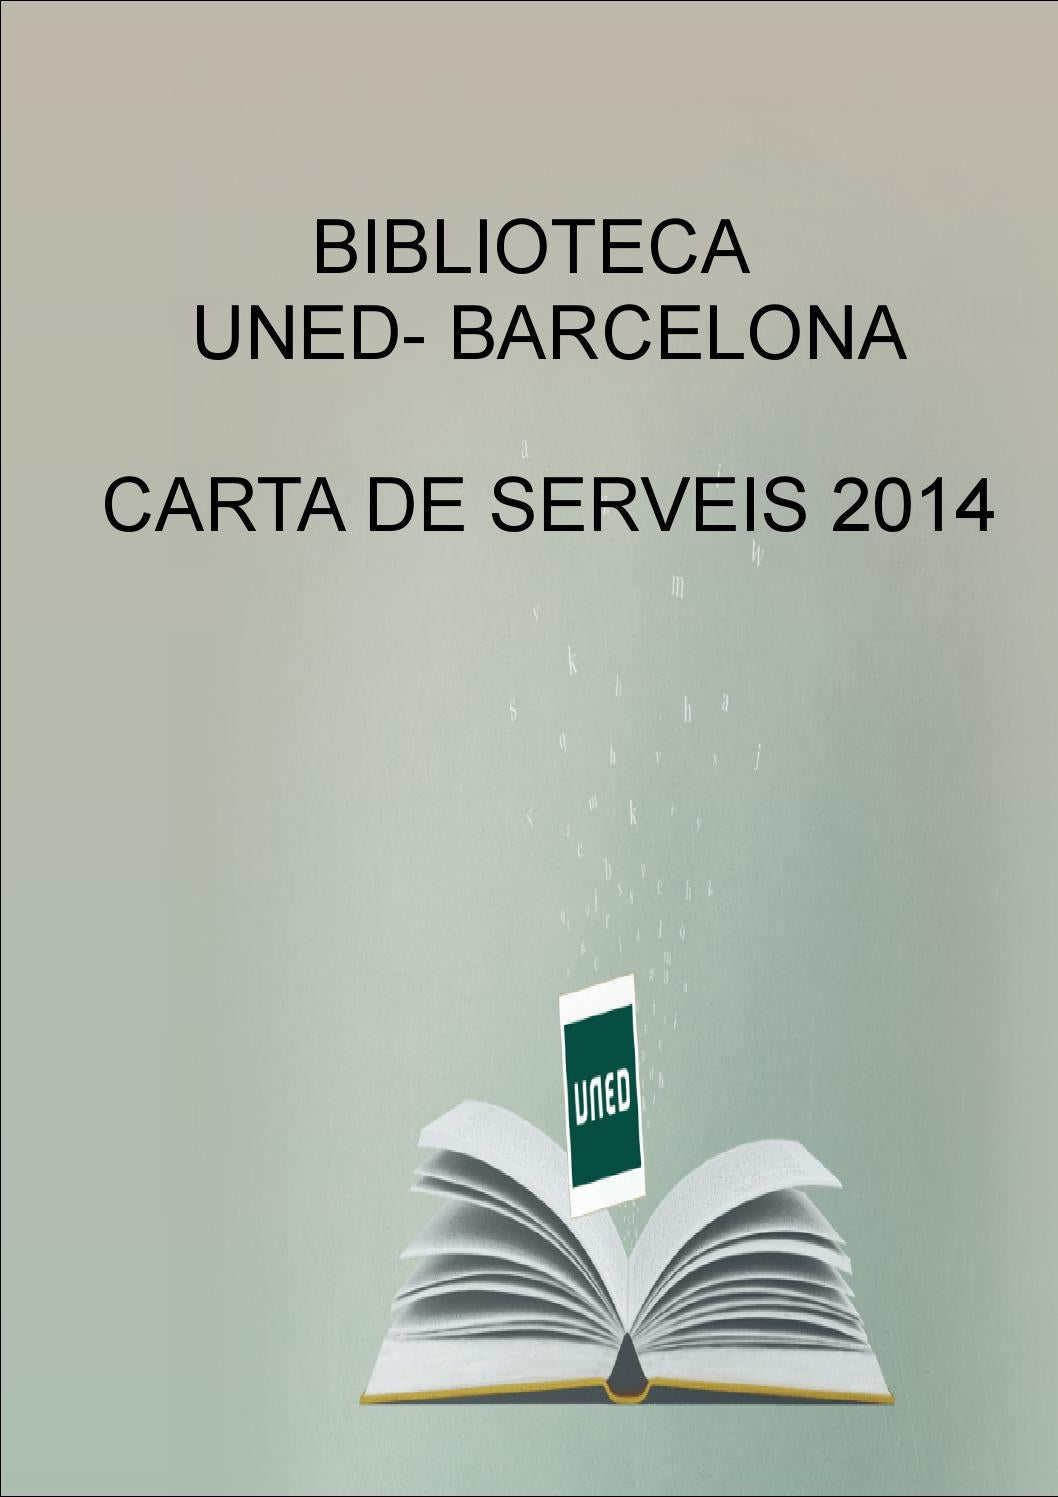 Carta de serveis de la biblioteca uned barcelona by for Biblioteca de la uned madrid